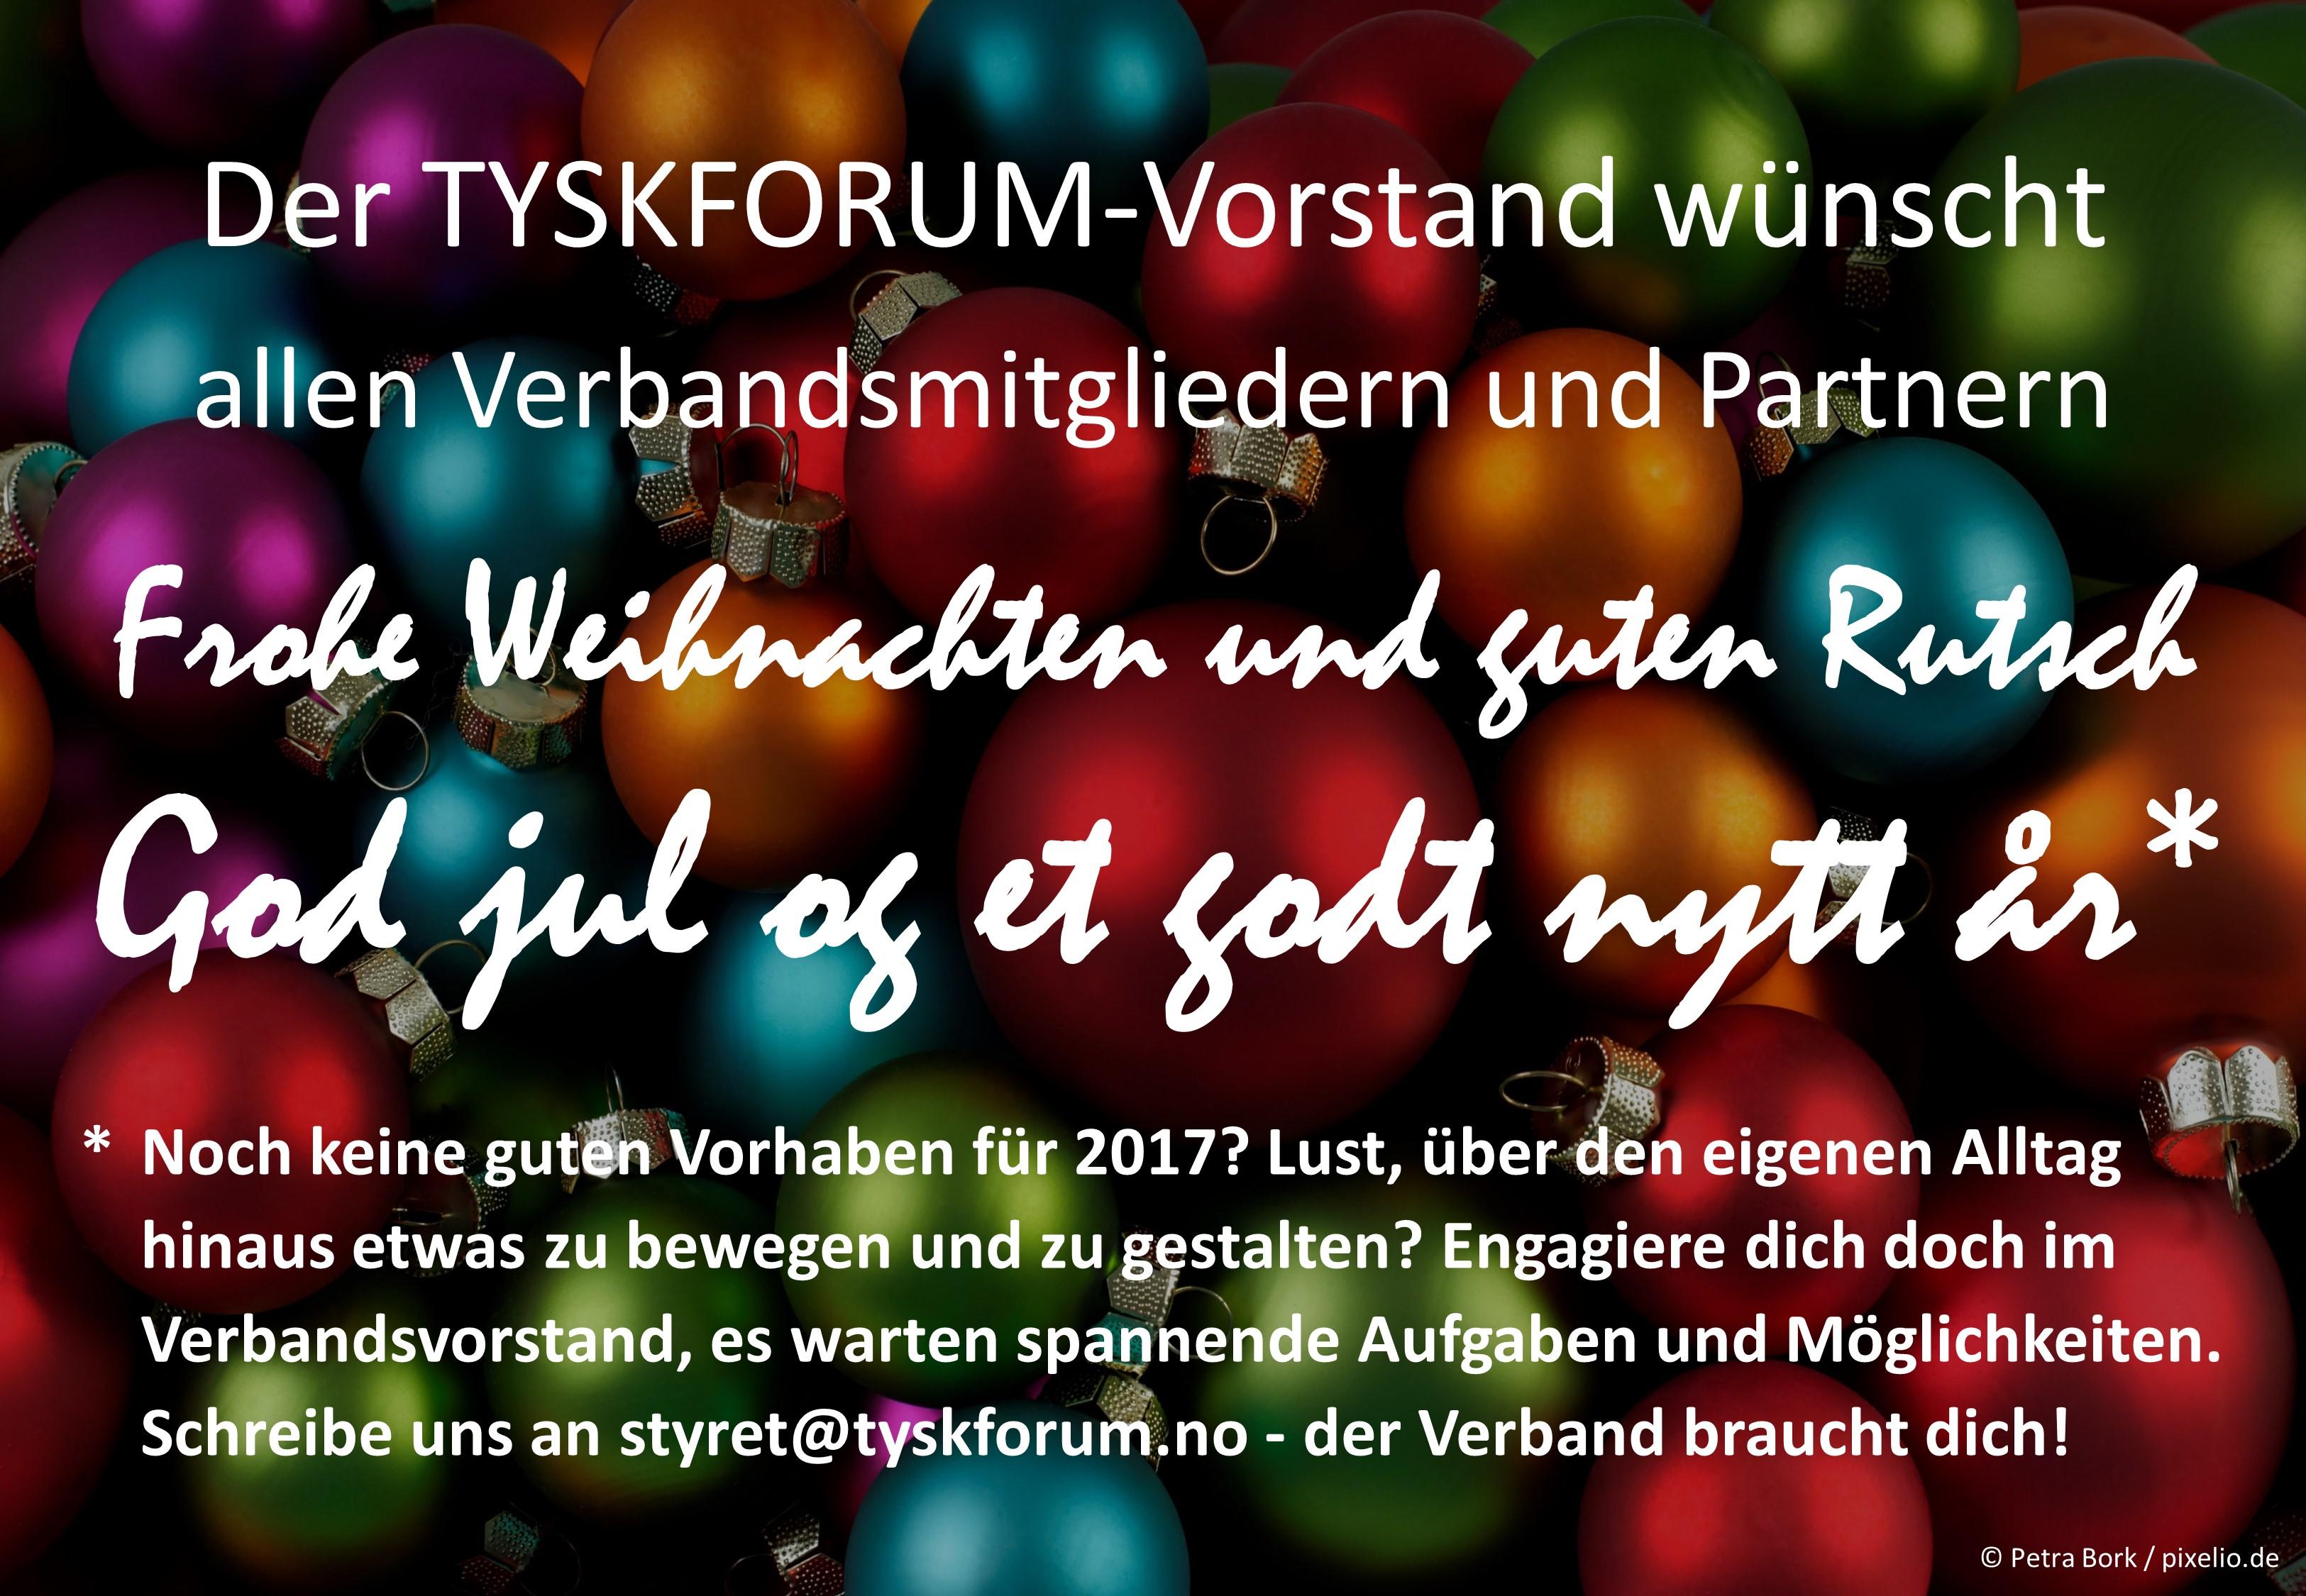 2016-12-20_tyskforum-julekort